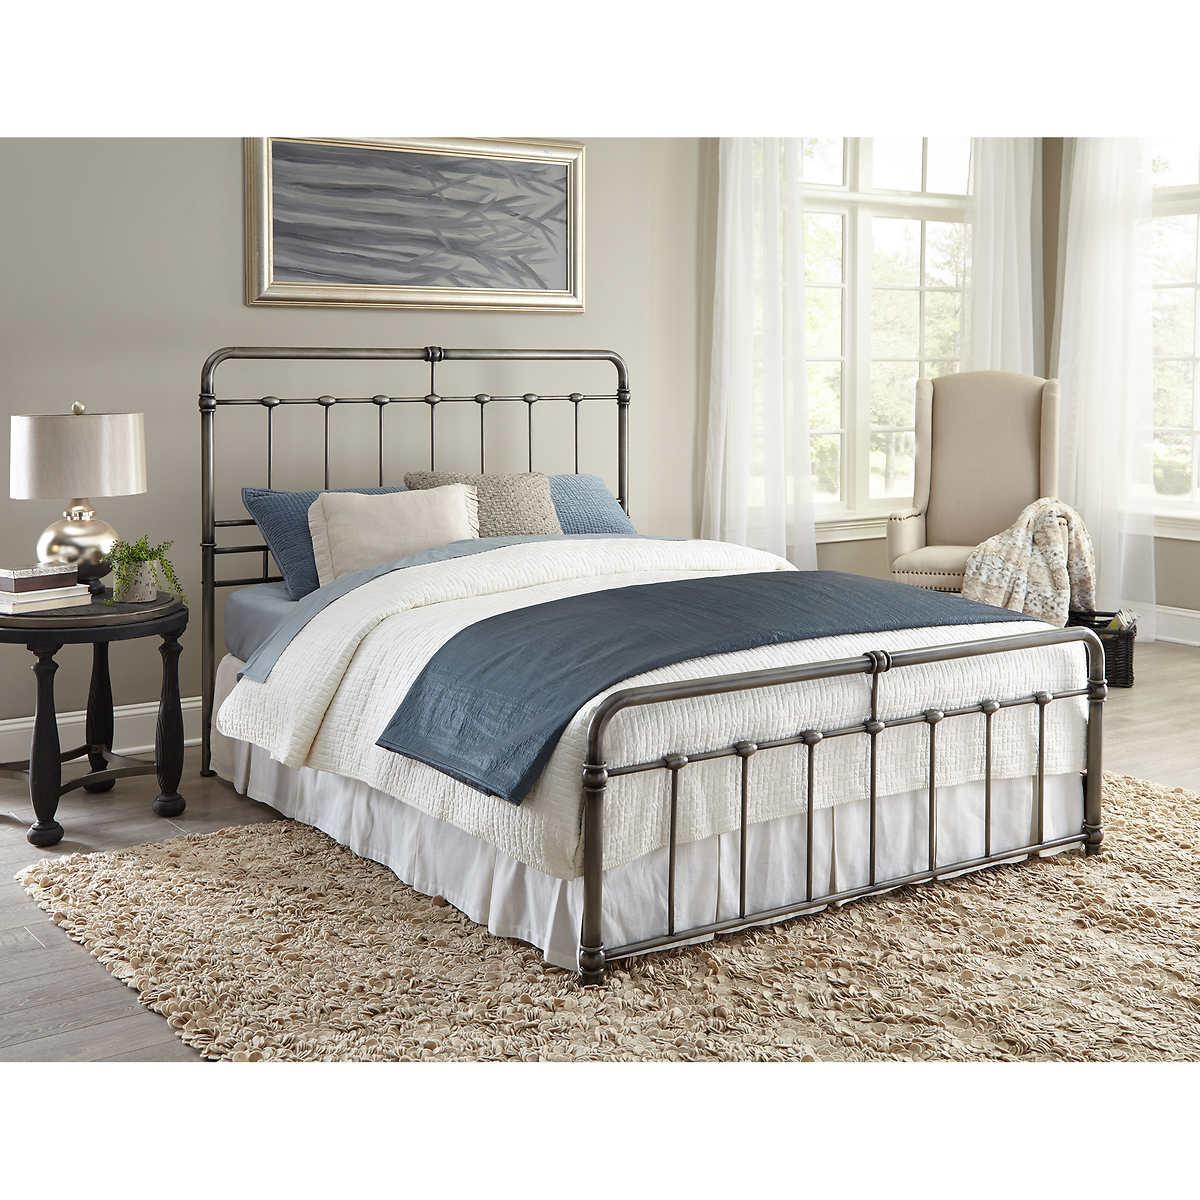 Providence Bedroom Furniture Beds